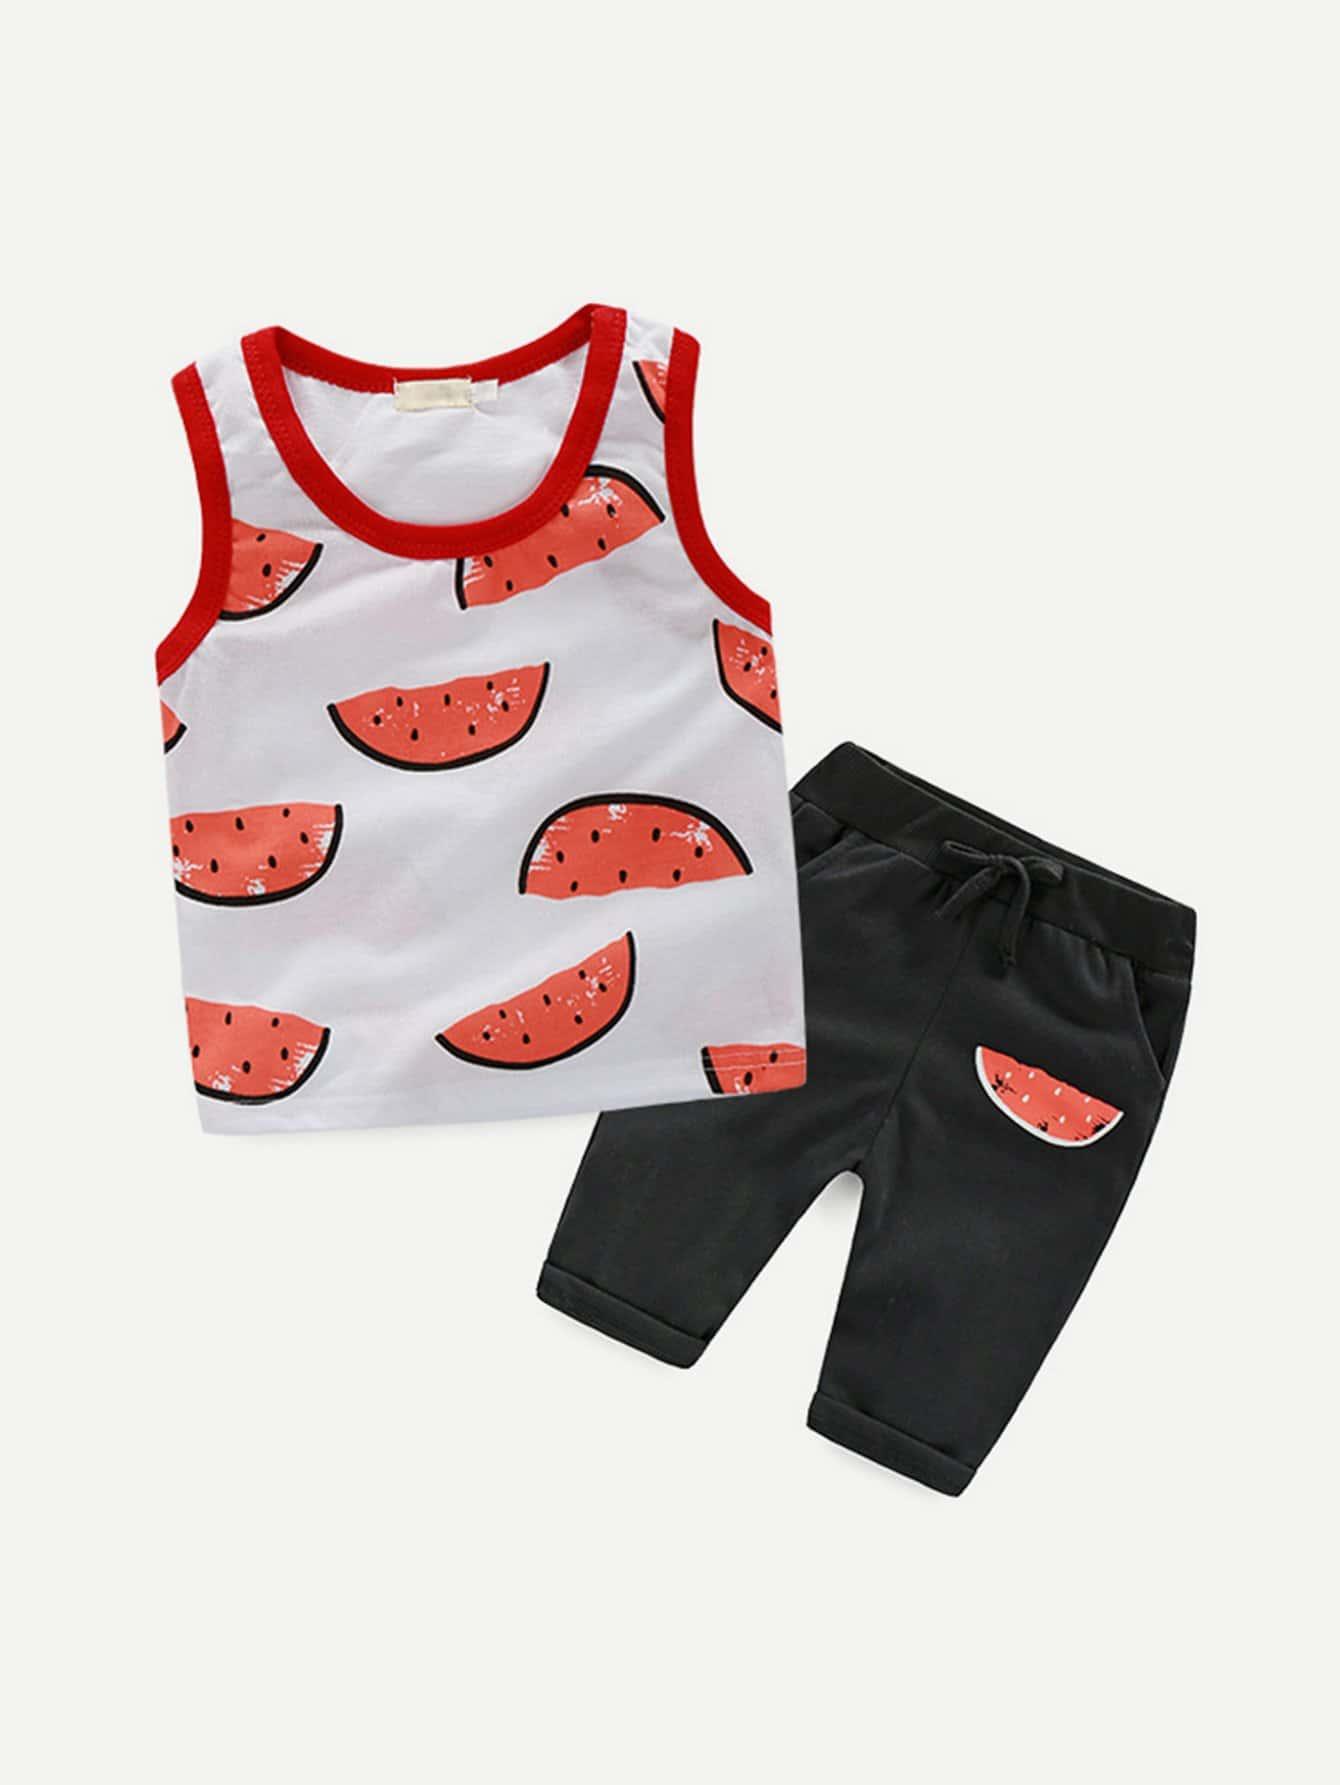 Boys Watermelon Print Top With Pants boys star print top with pants